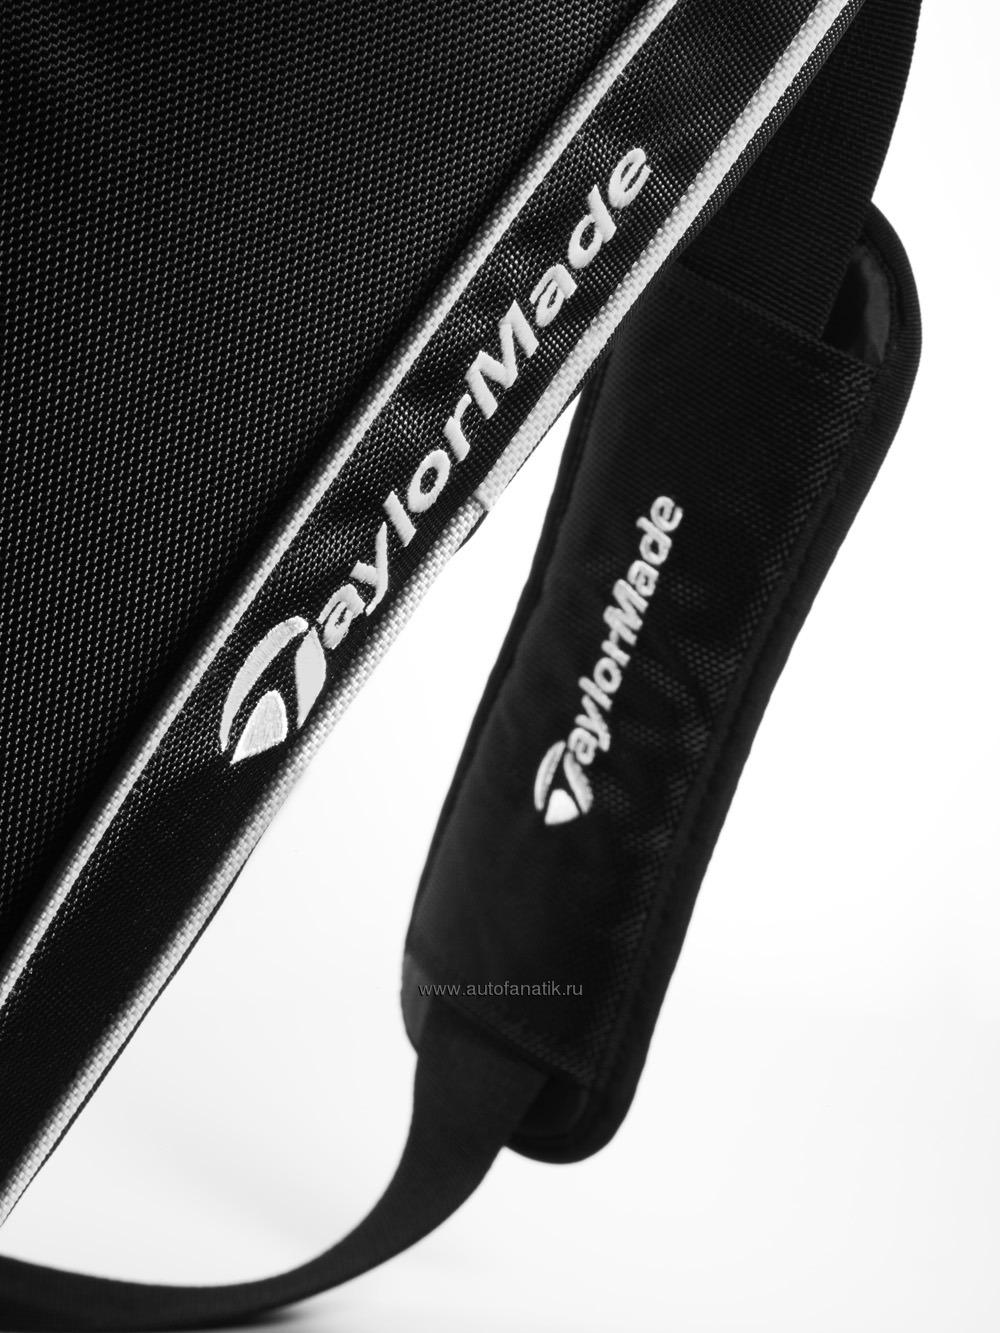 Mercedes benz golf sports bag for Mercedes benz golf bag